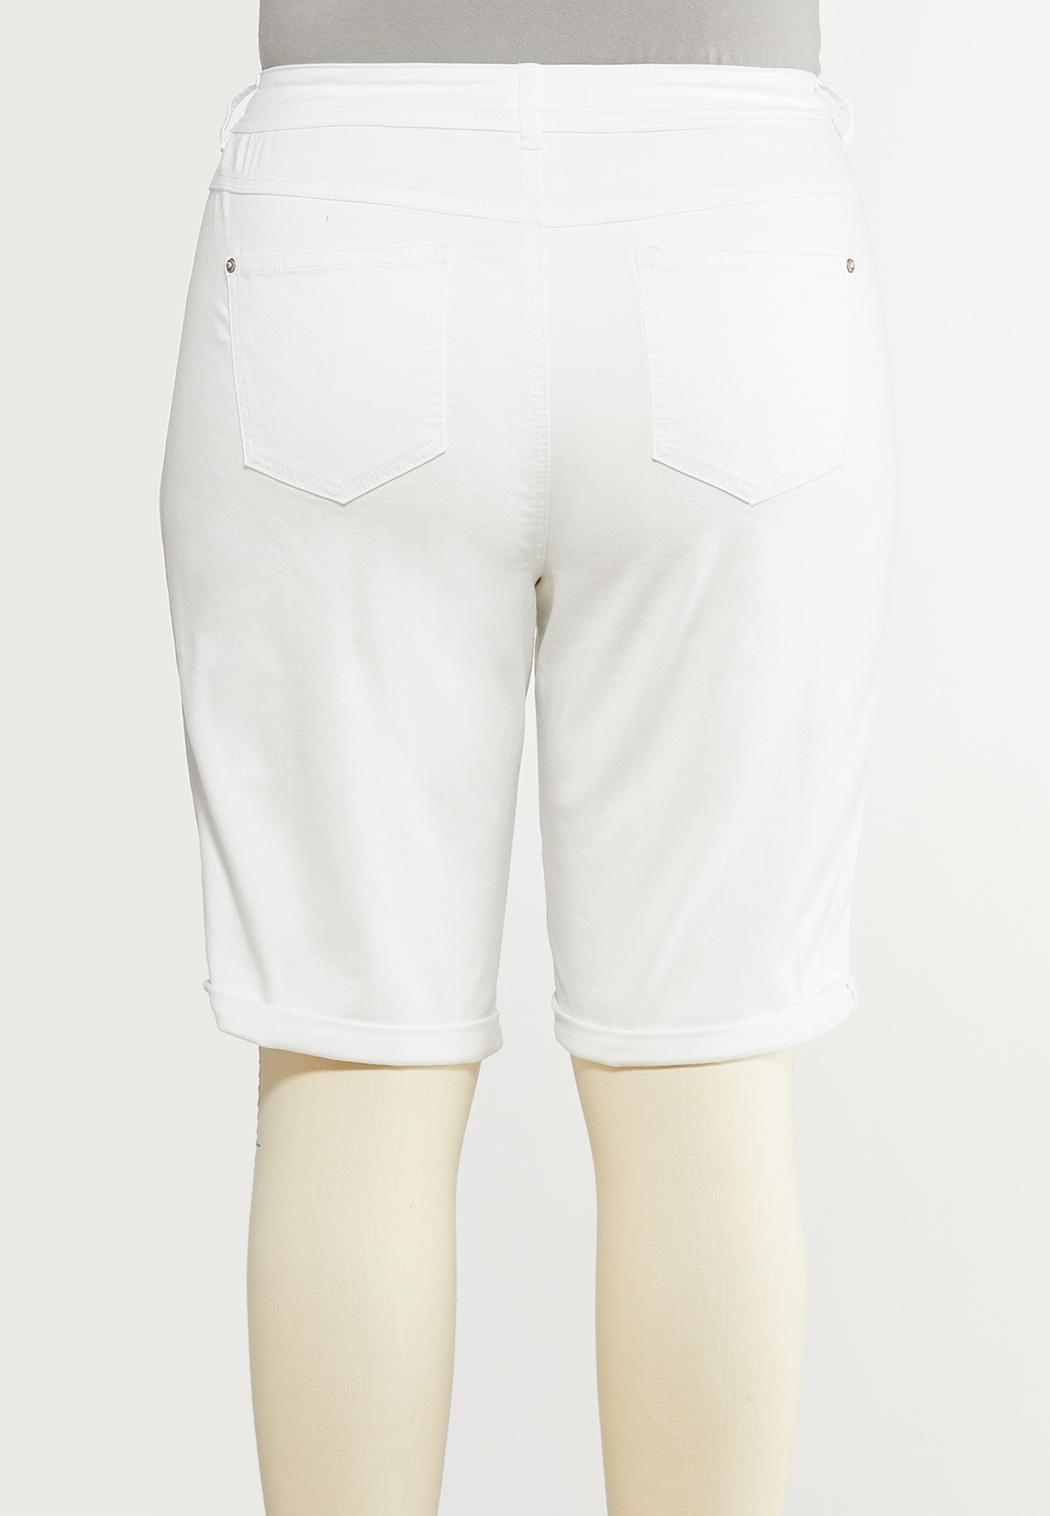 Plus Size White Jean Shorts (Item #44142275)